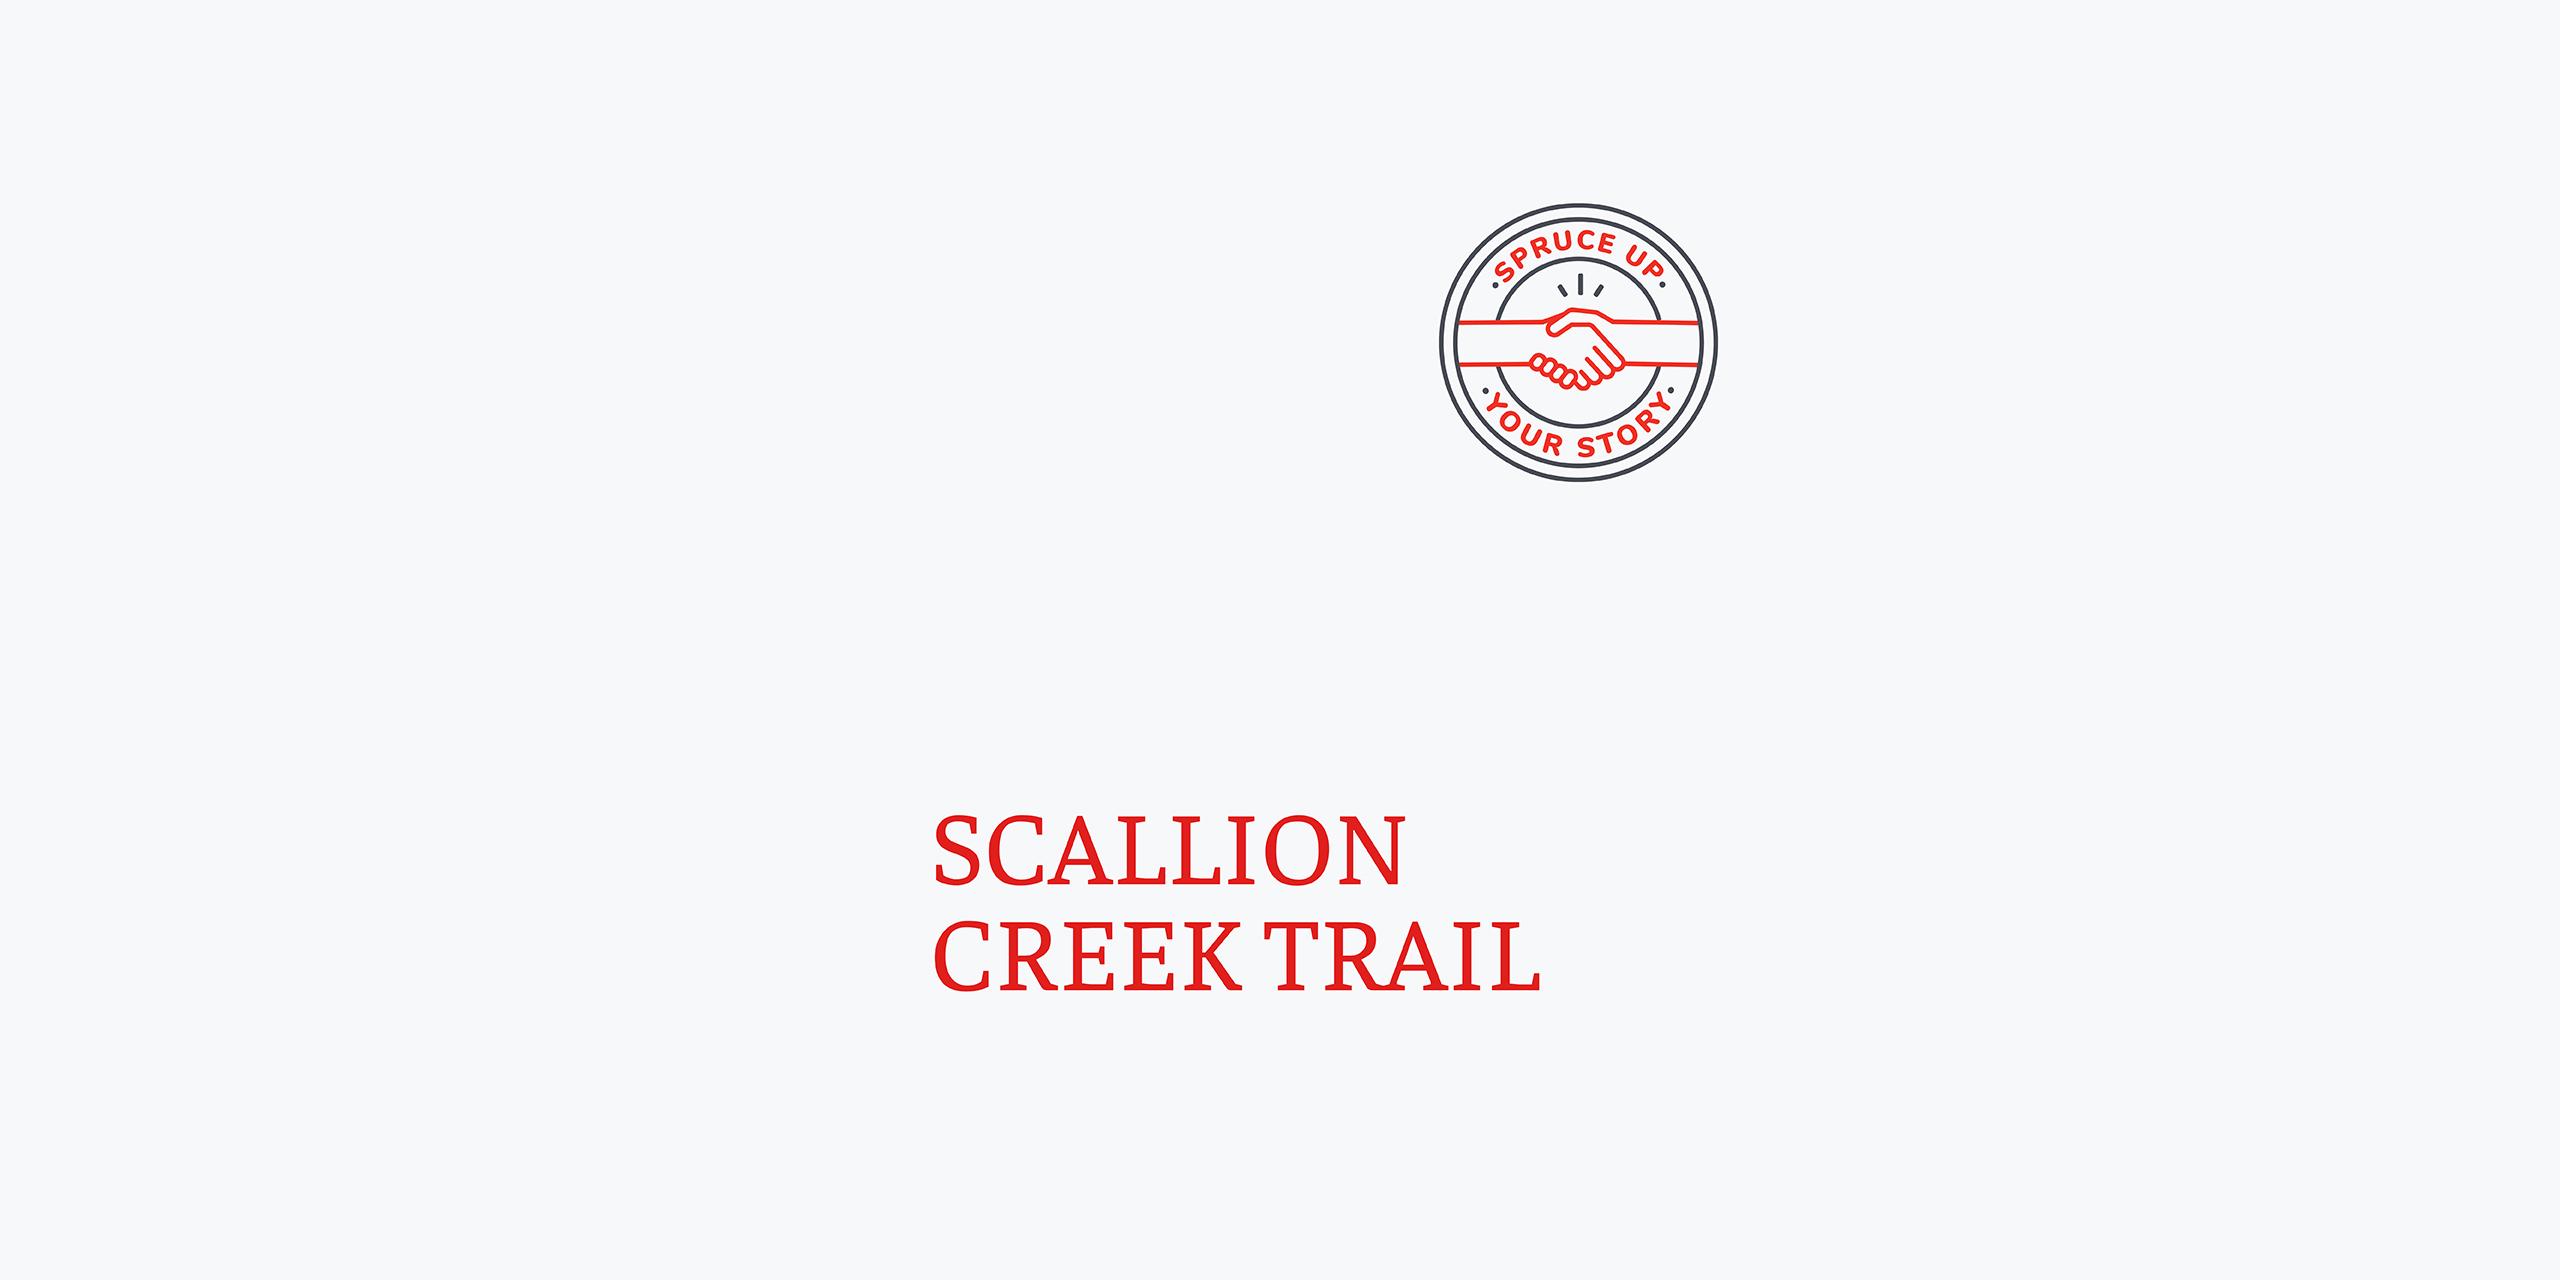 Scallion Creek Trail